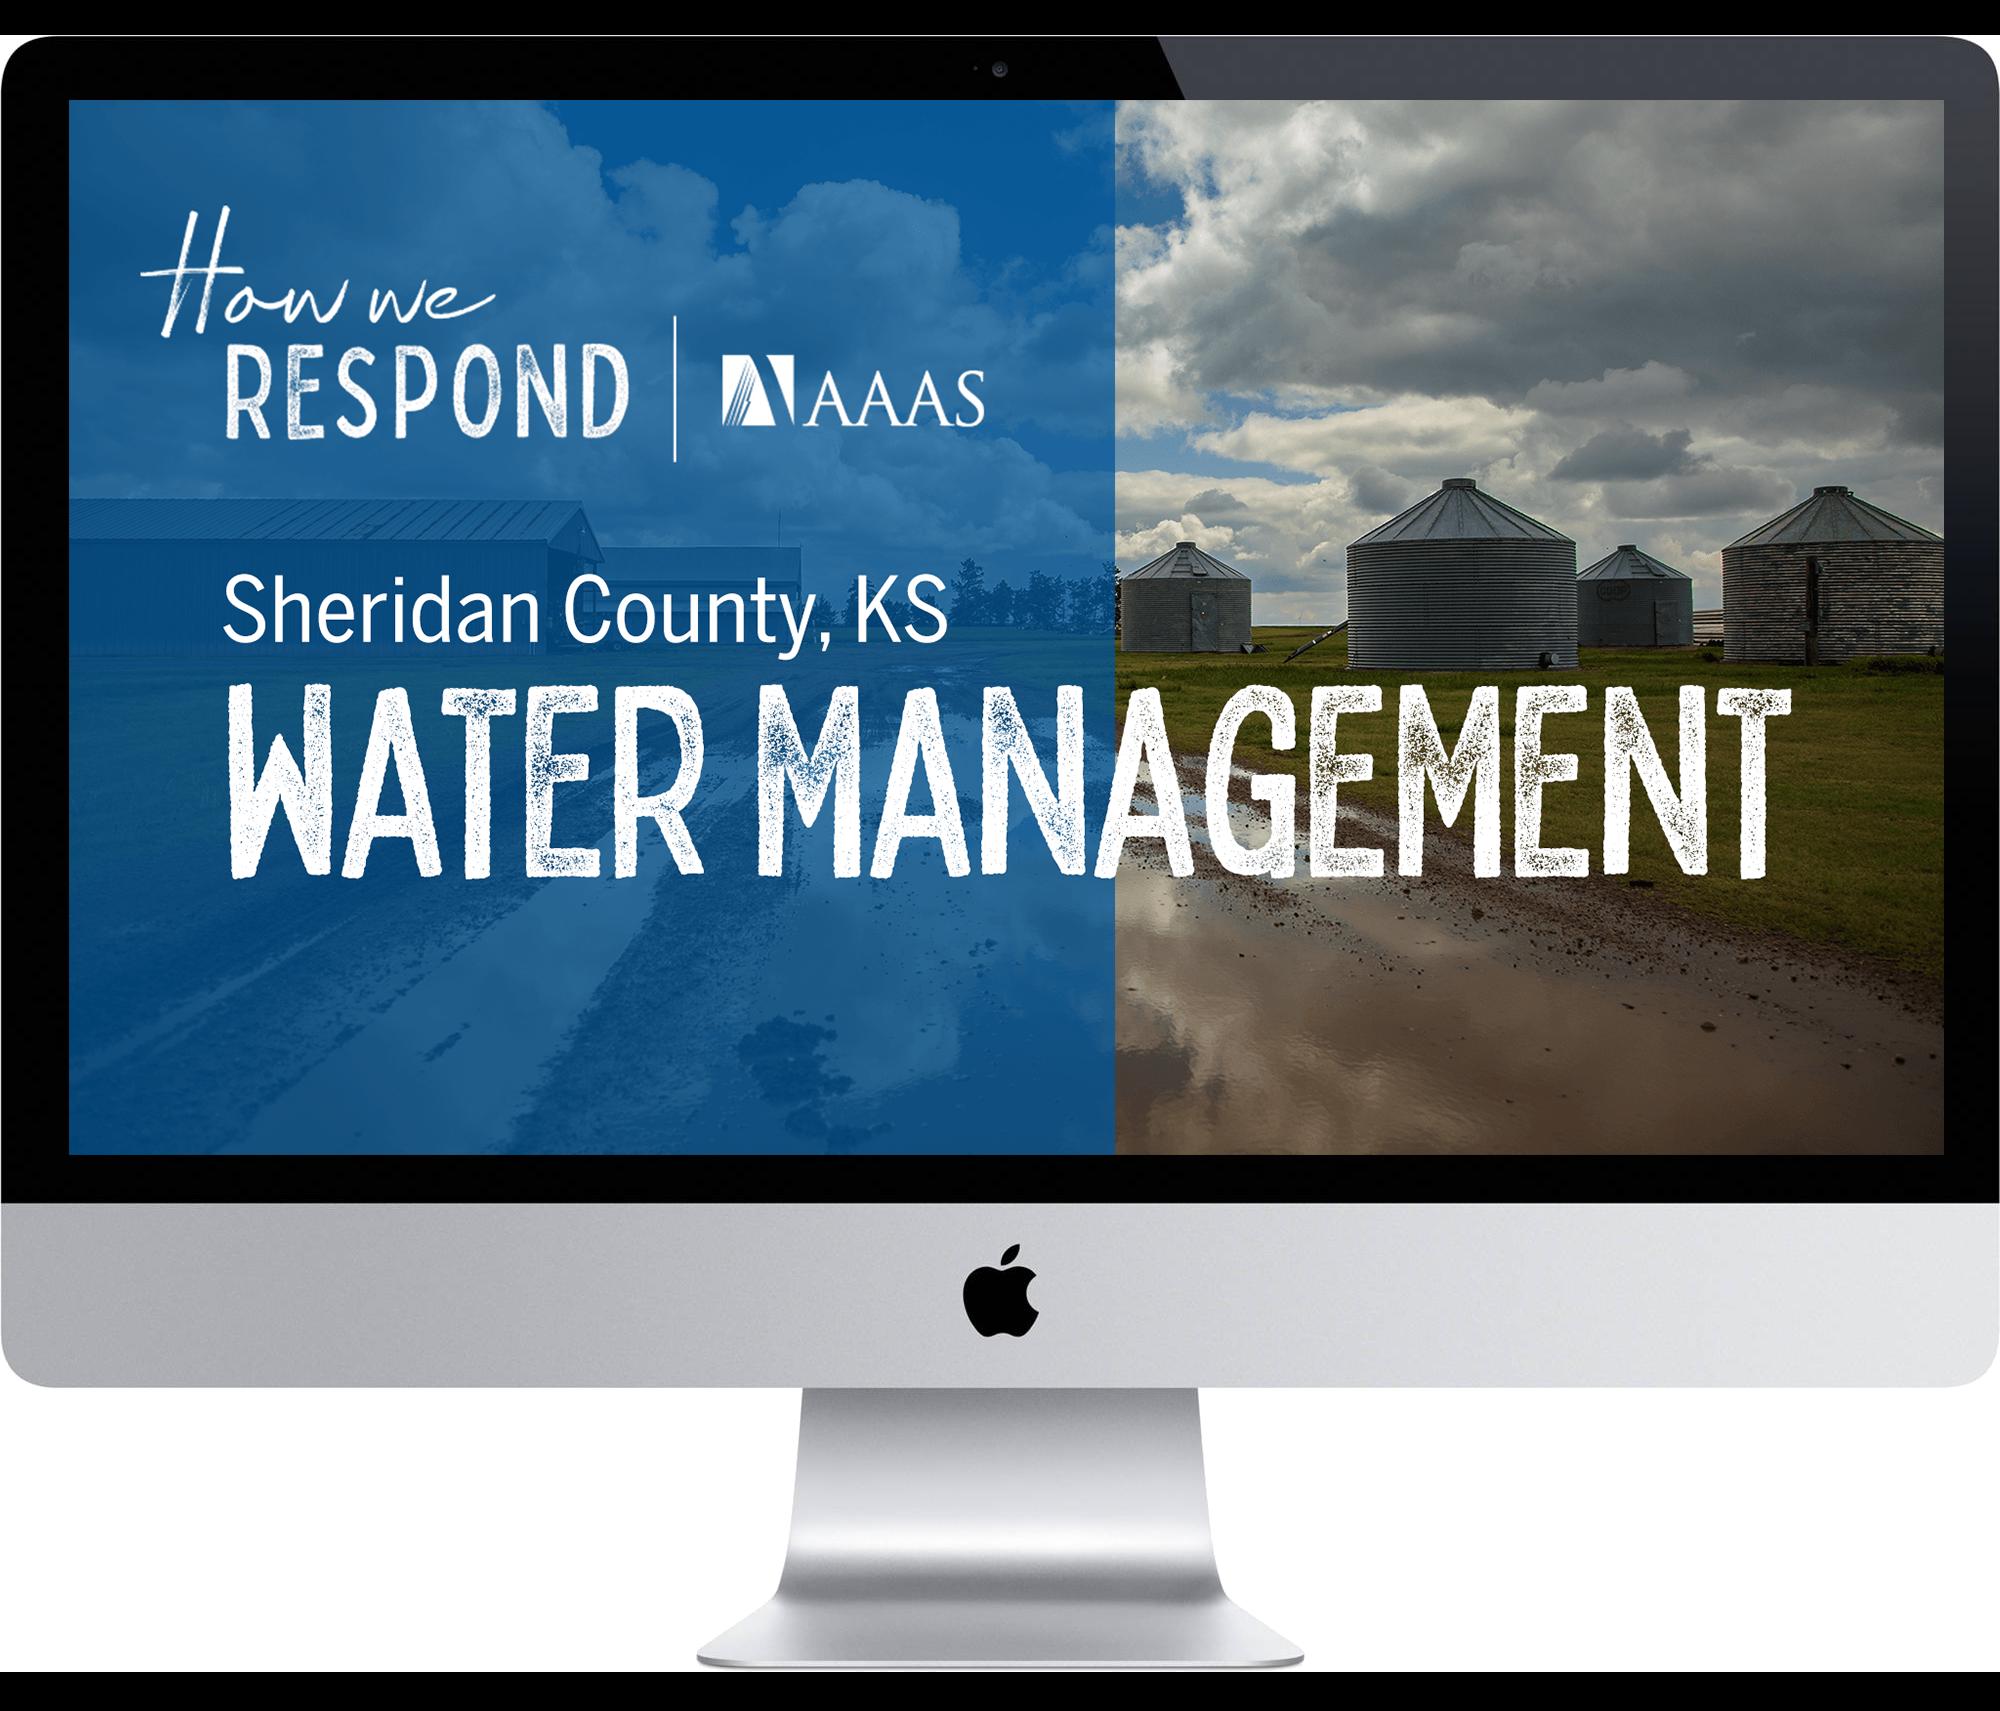 Sheridan County, KS - Water